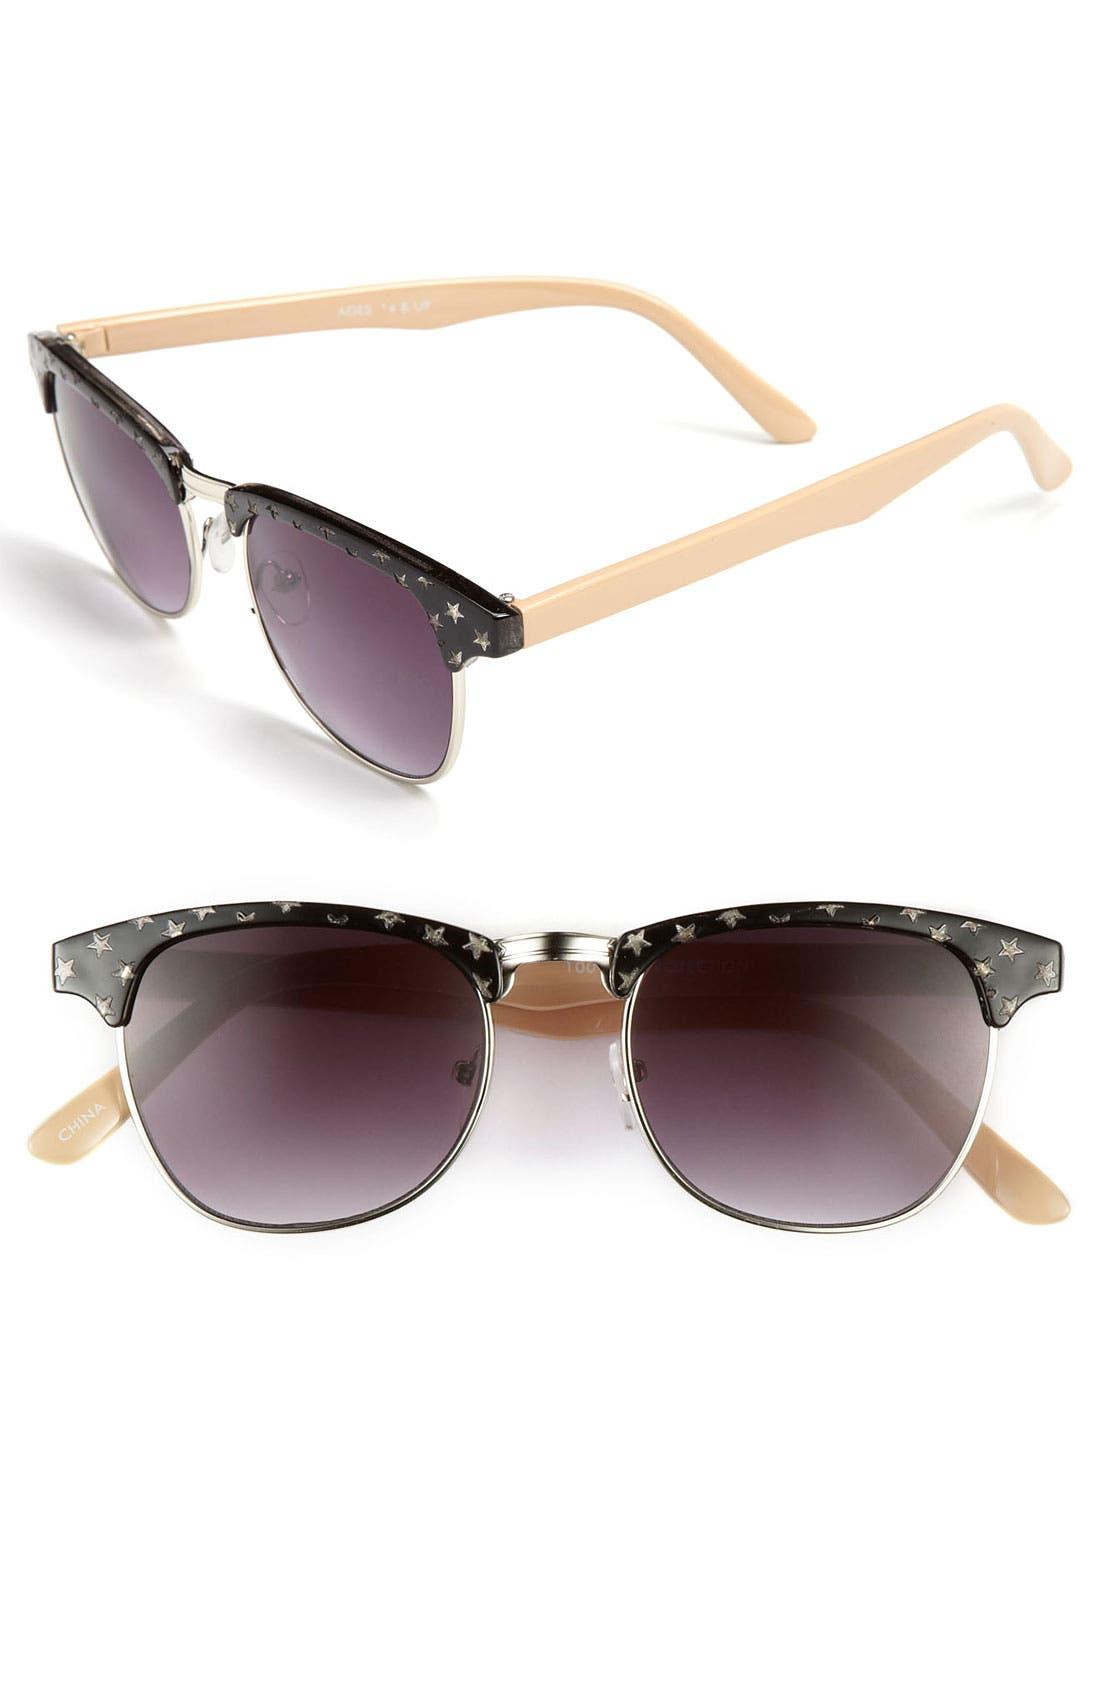 Alternate Image 1 Selected - FE NY 'Star' Sunglasses